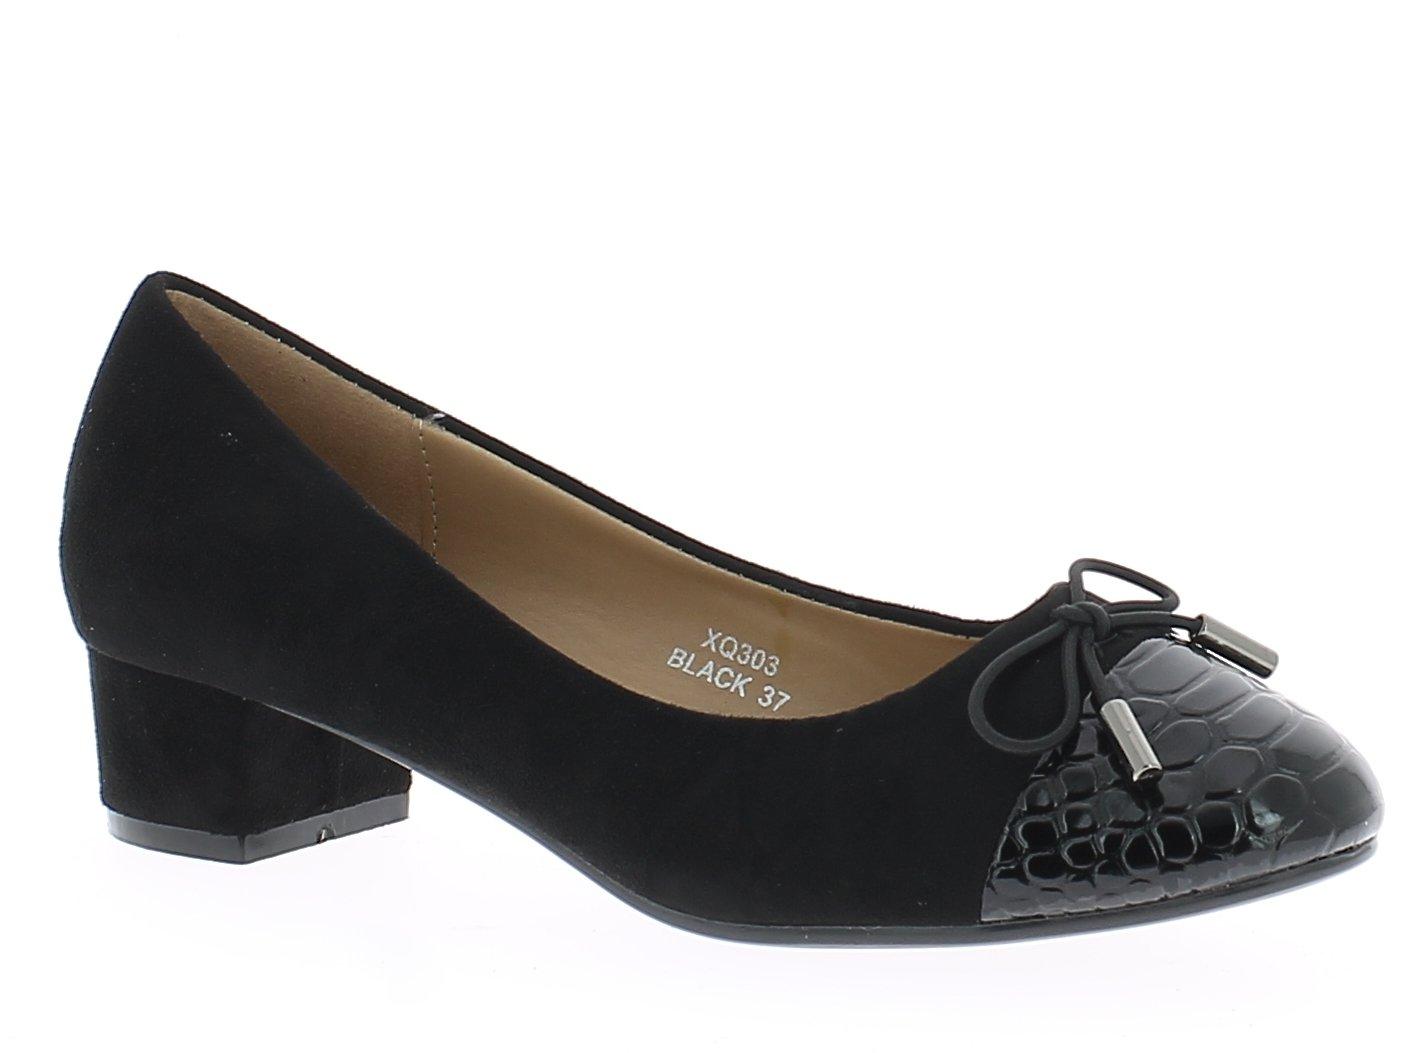 IQSHOES Γυναικεία Γόβα XQ303 Μαύρο - IqShoes - XQ303 black 38/1/15/11 παπούτσια  προσφορεσ